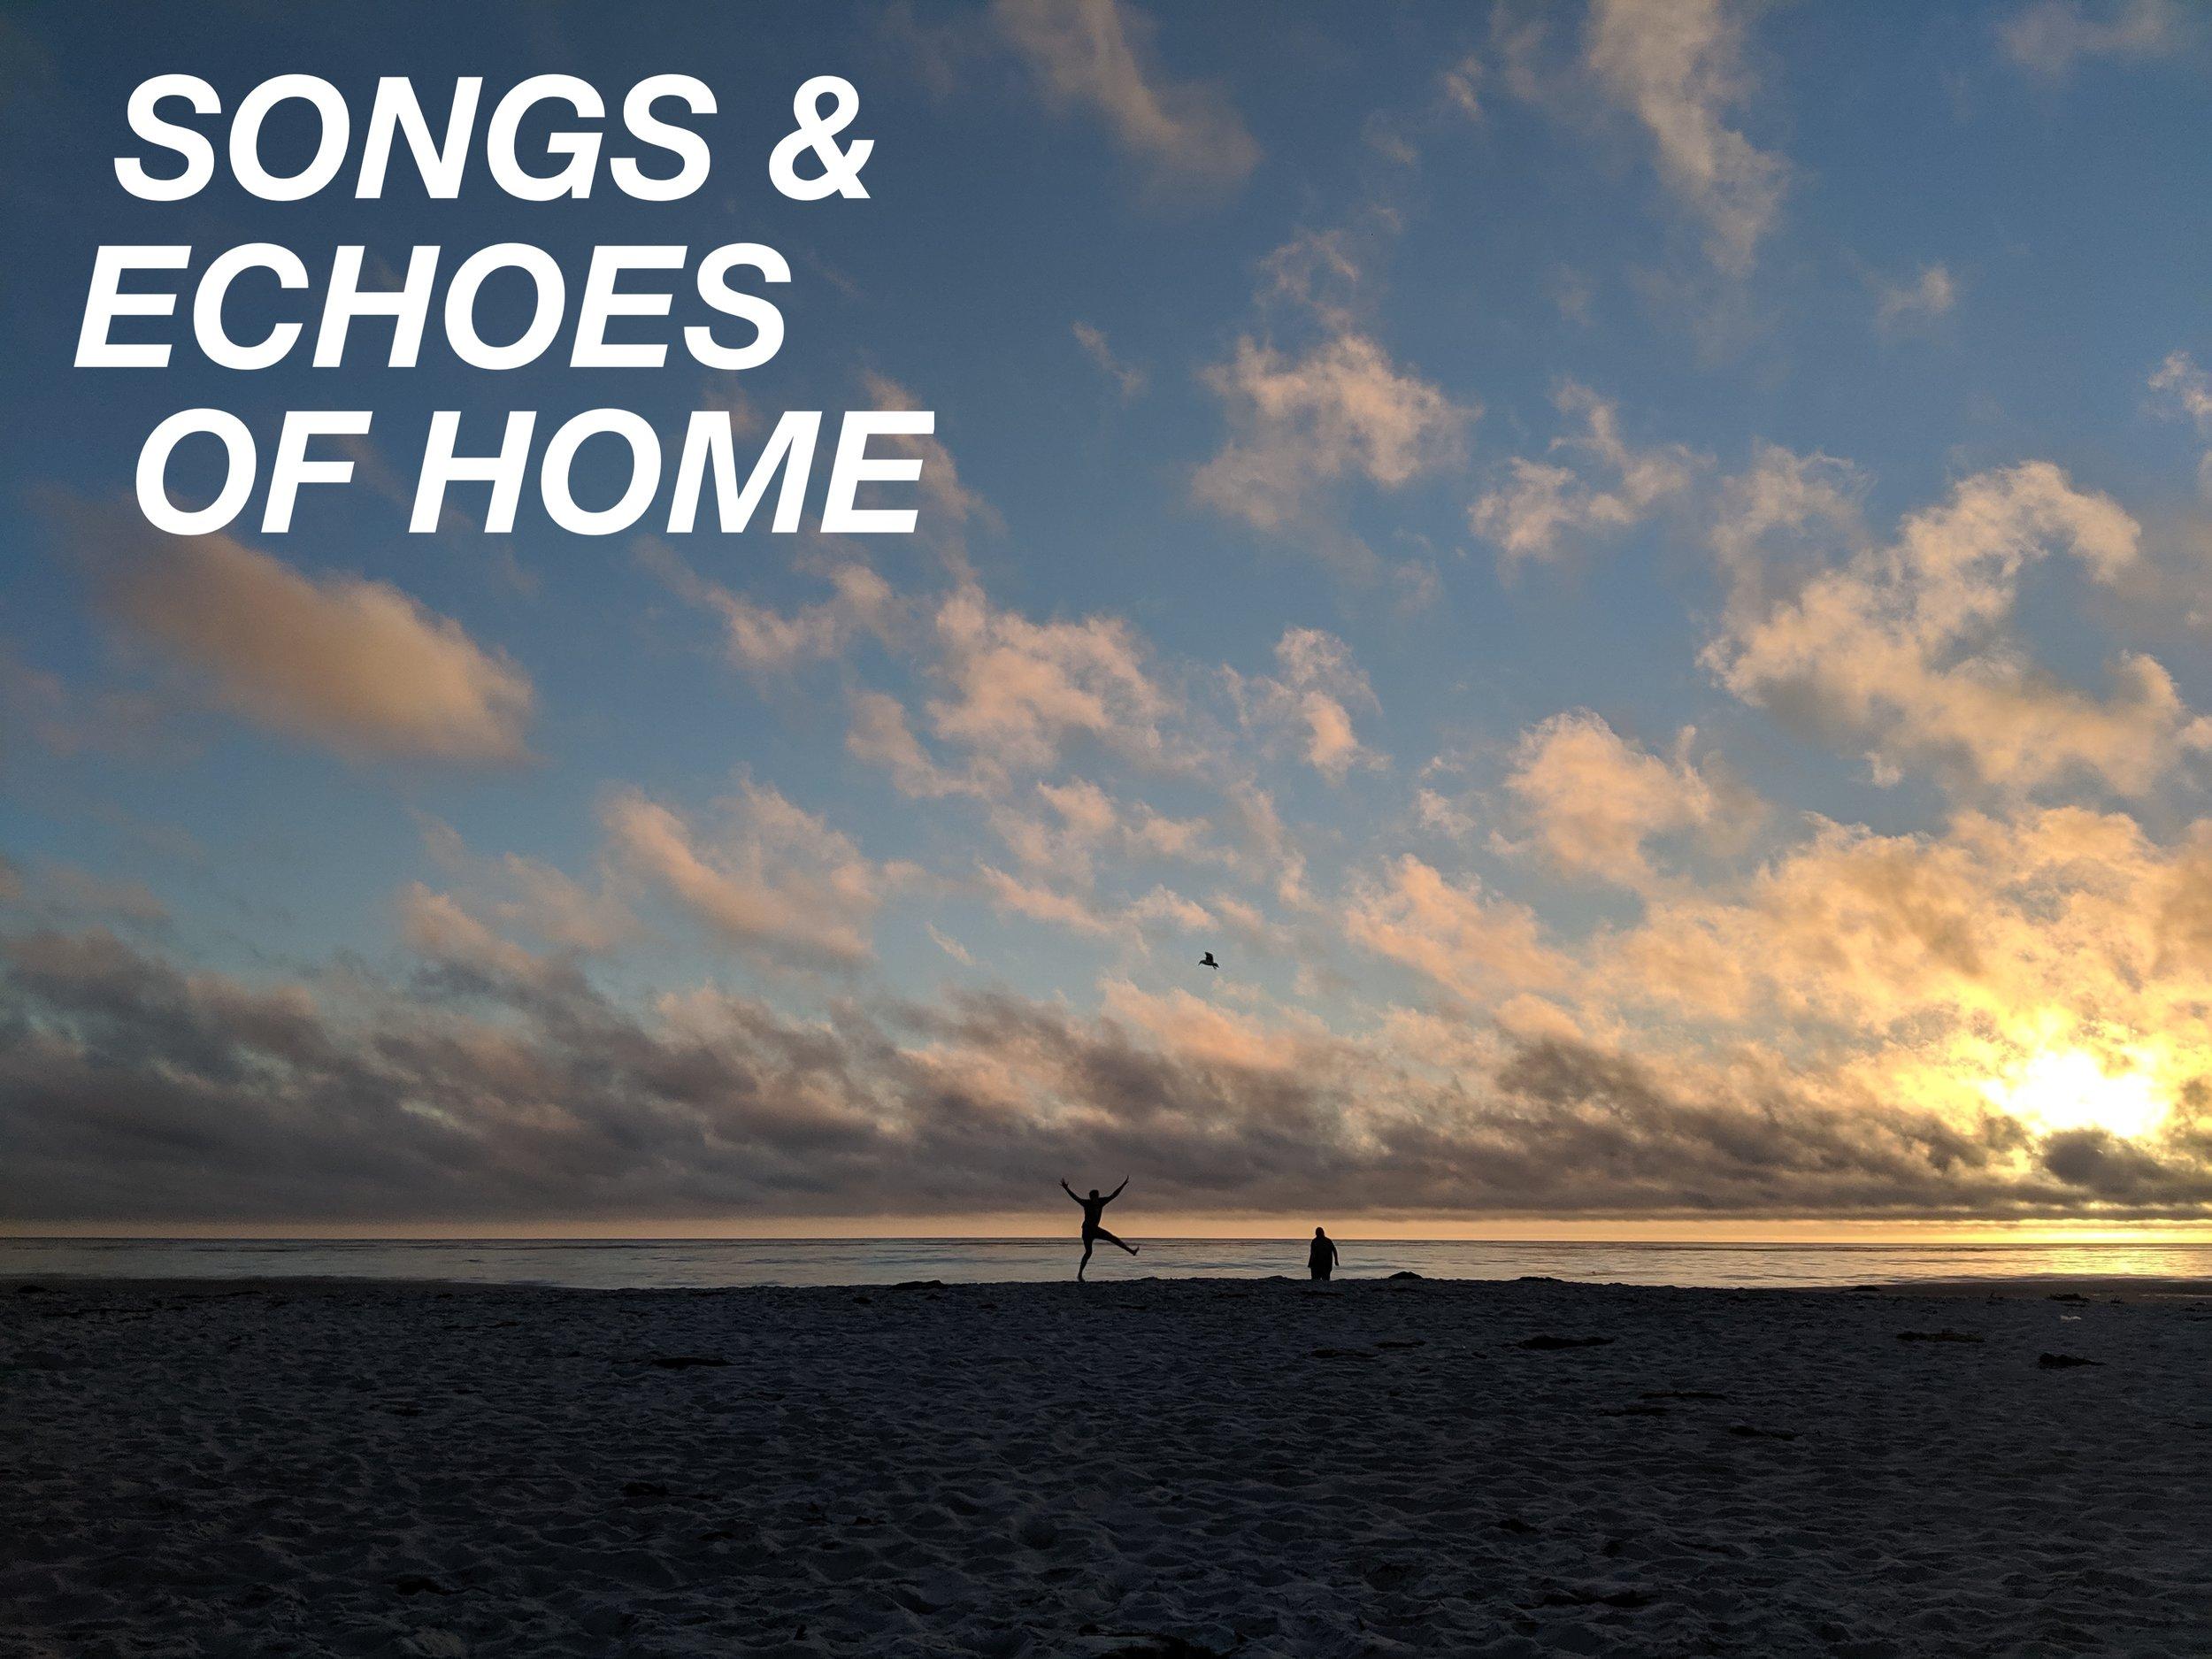 Songs & Echoes Program Promo Photo.jpg